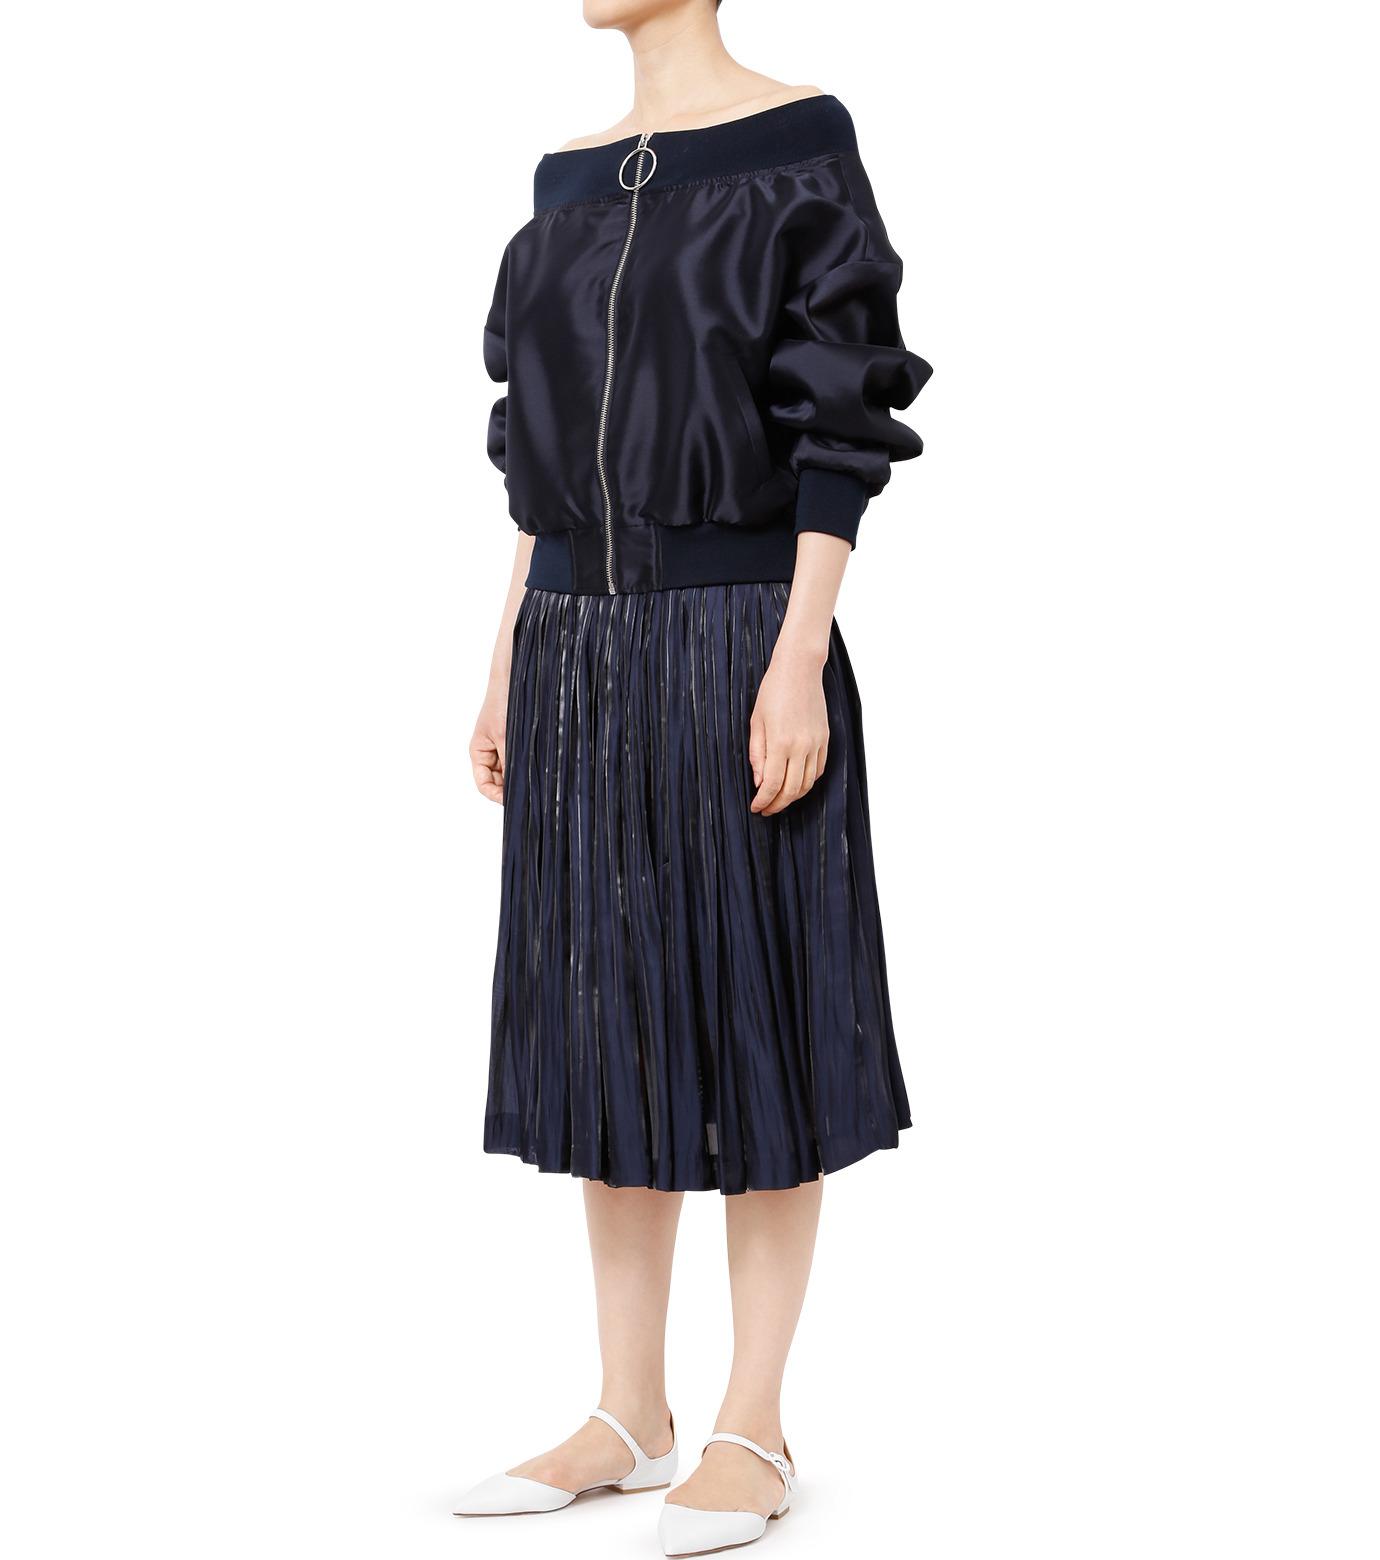 LE CIEL BLEU(ルシェルブルー)のプリーツスカート-NAVY(スカート/skirt)-18A67206 拡大詳細画像3